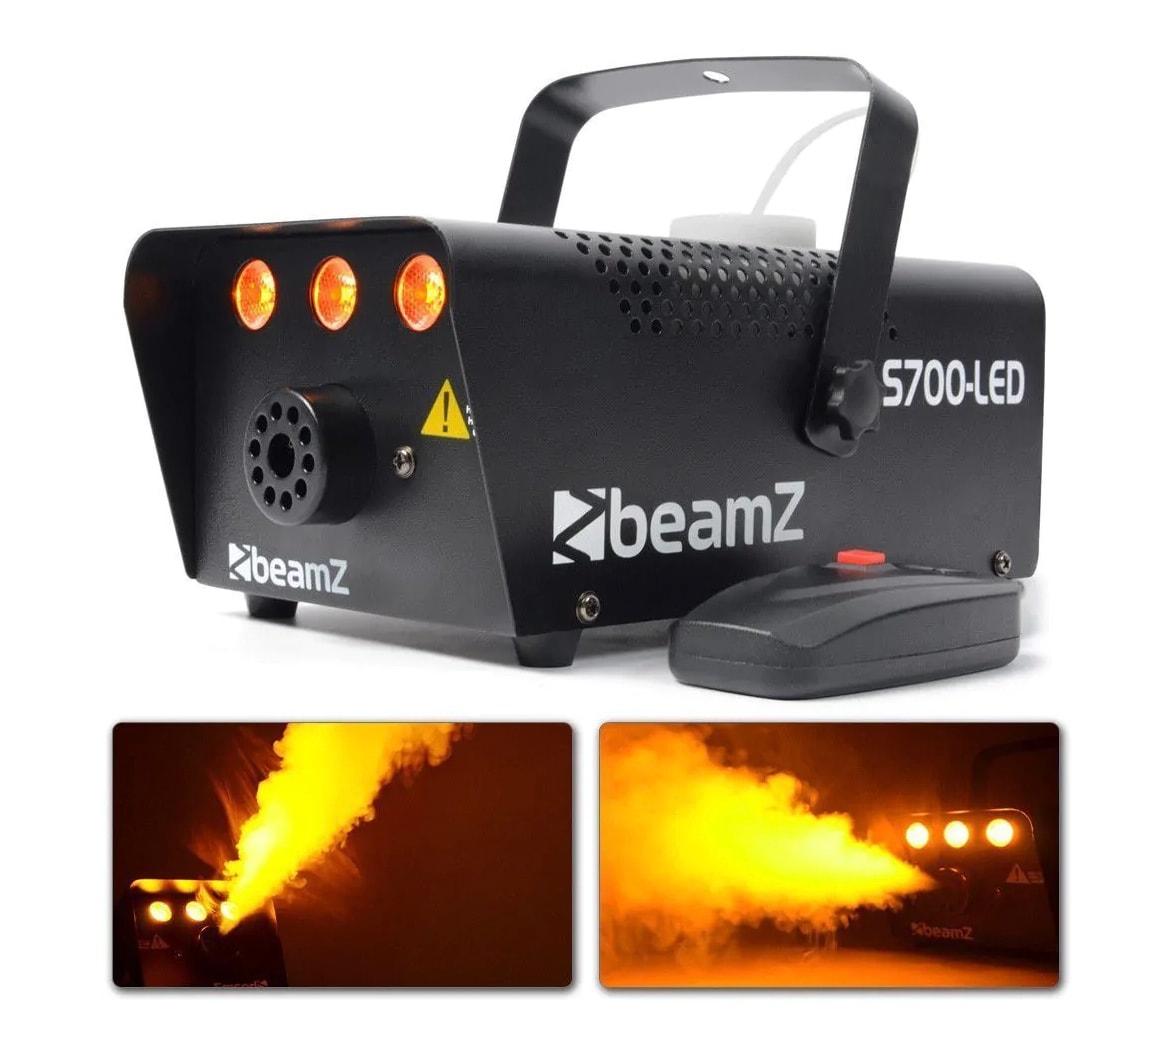 BeamZ S700-LED smokemachine +Flame effect